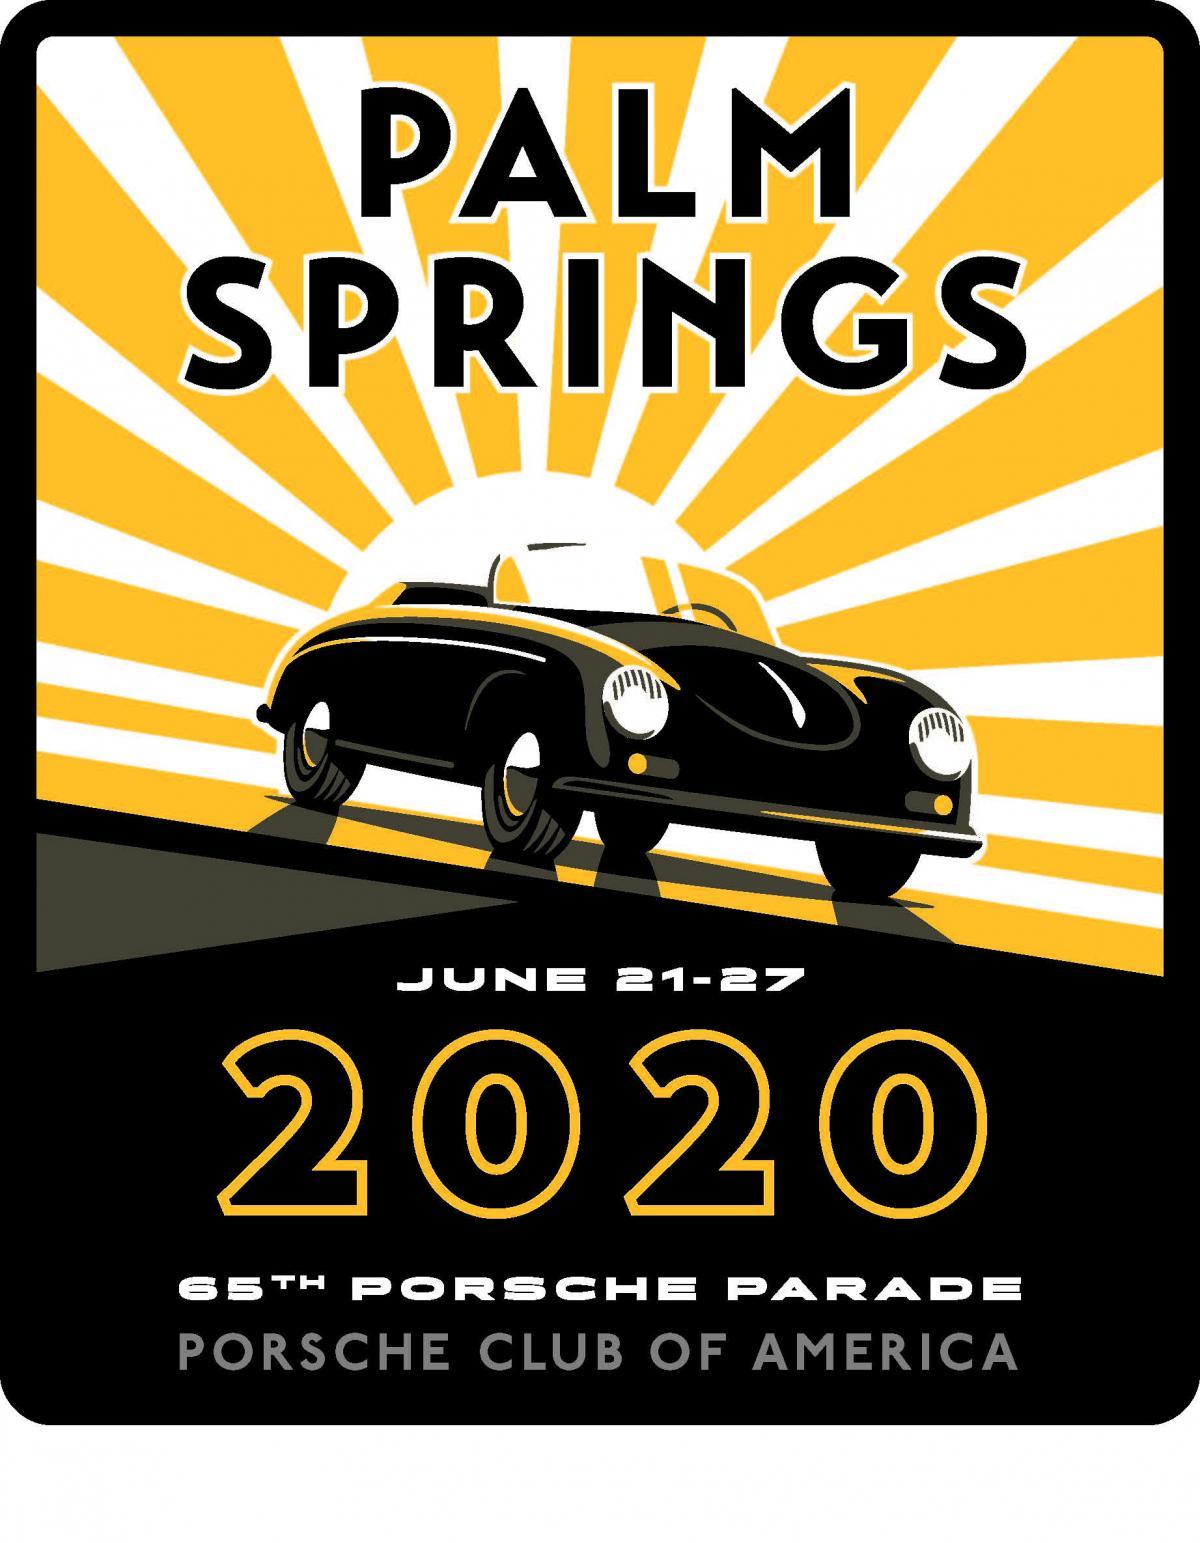 PCA_Parade_PalmSprings2020_w-date_4 Magnets_PCA BRANDING